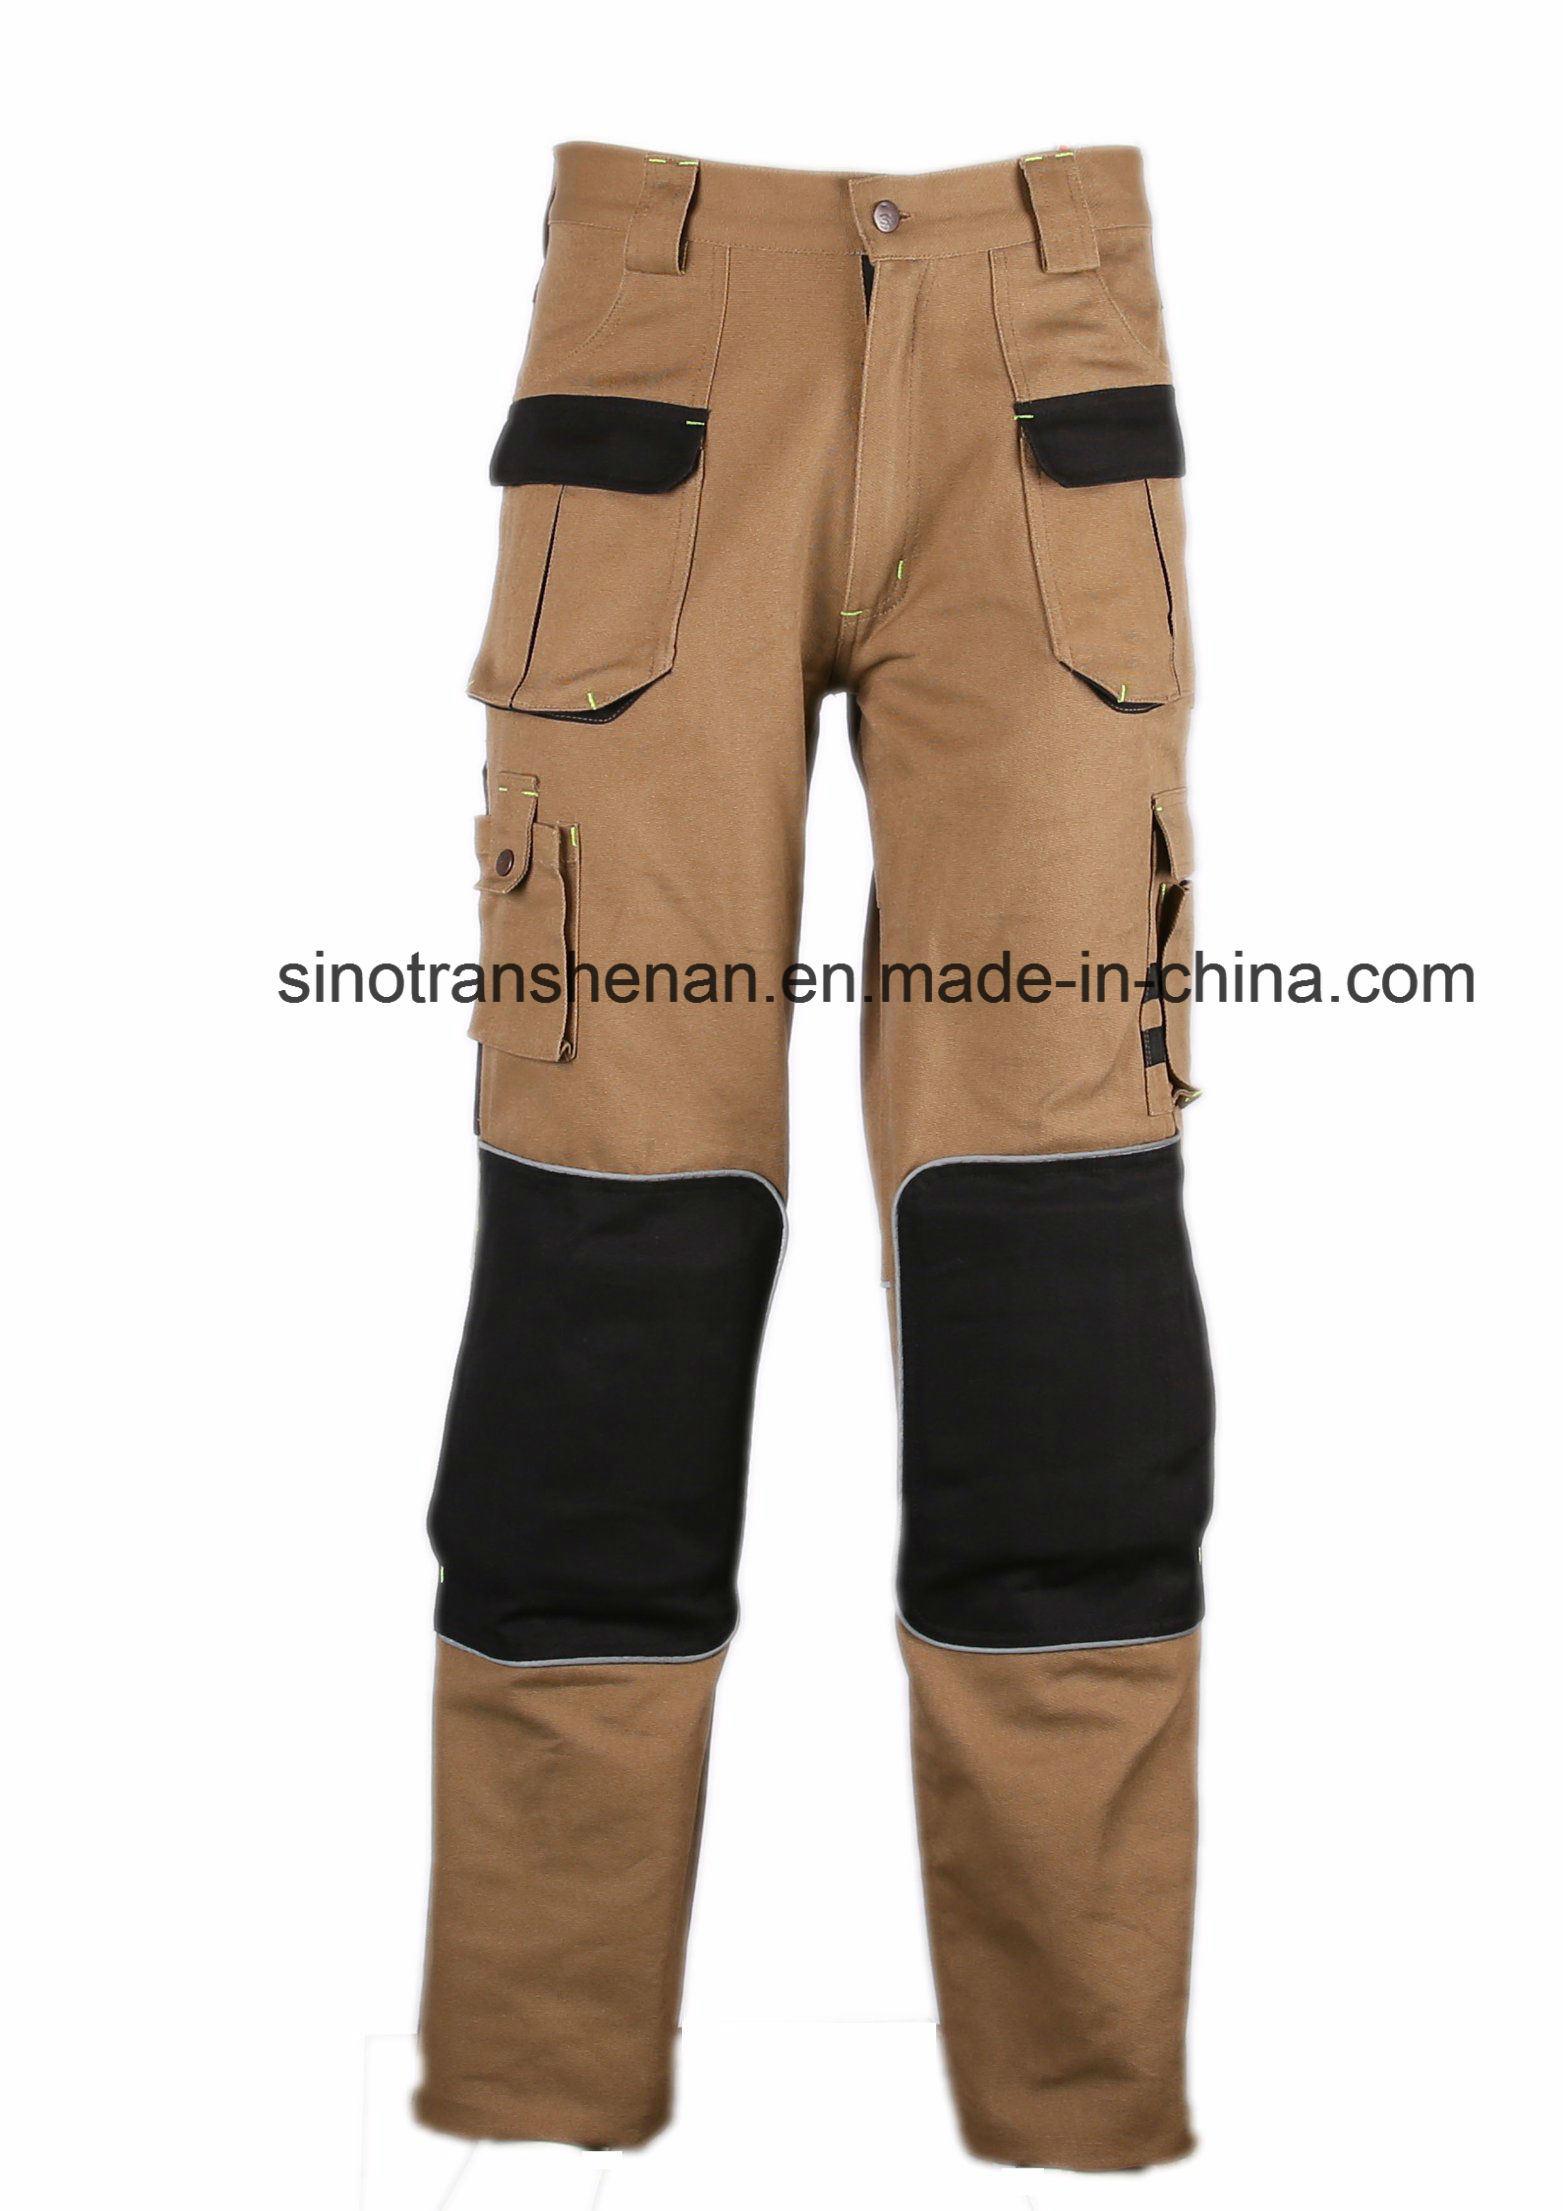 100% Cotton Cargo Pants Work Pants